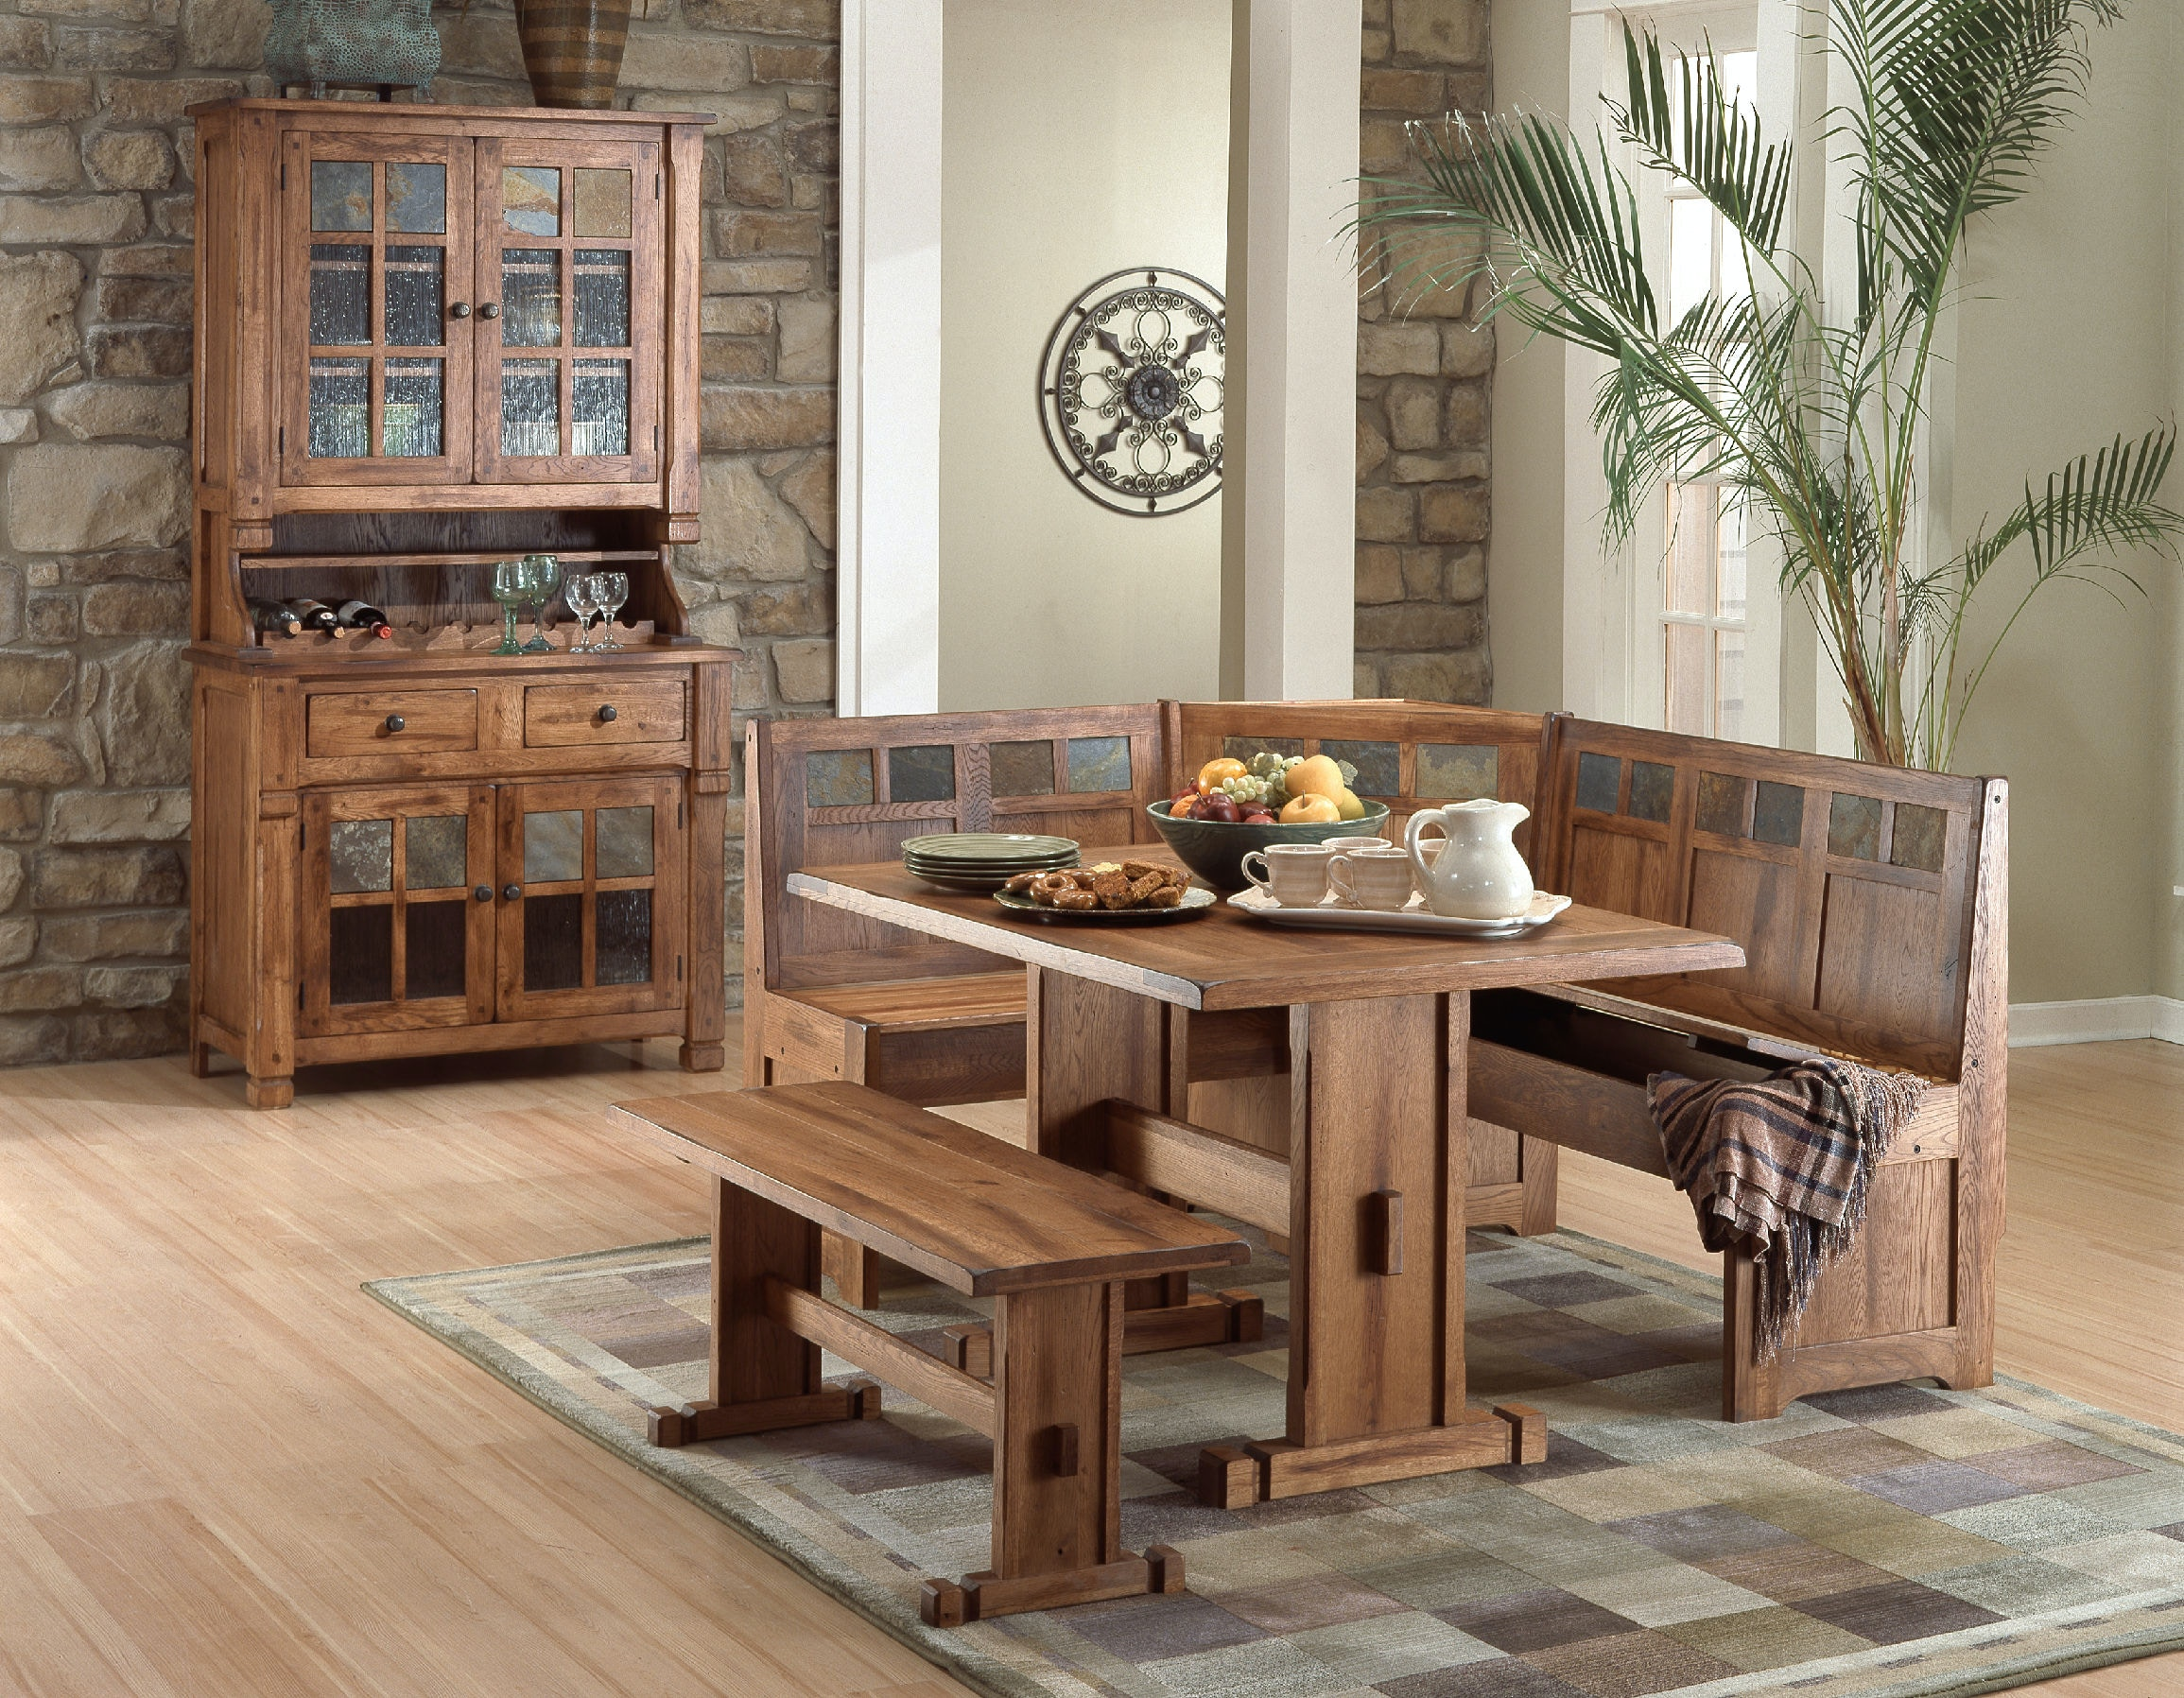 Sedona Breakfast Nook Set With Side Bench 0219/NOOK